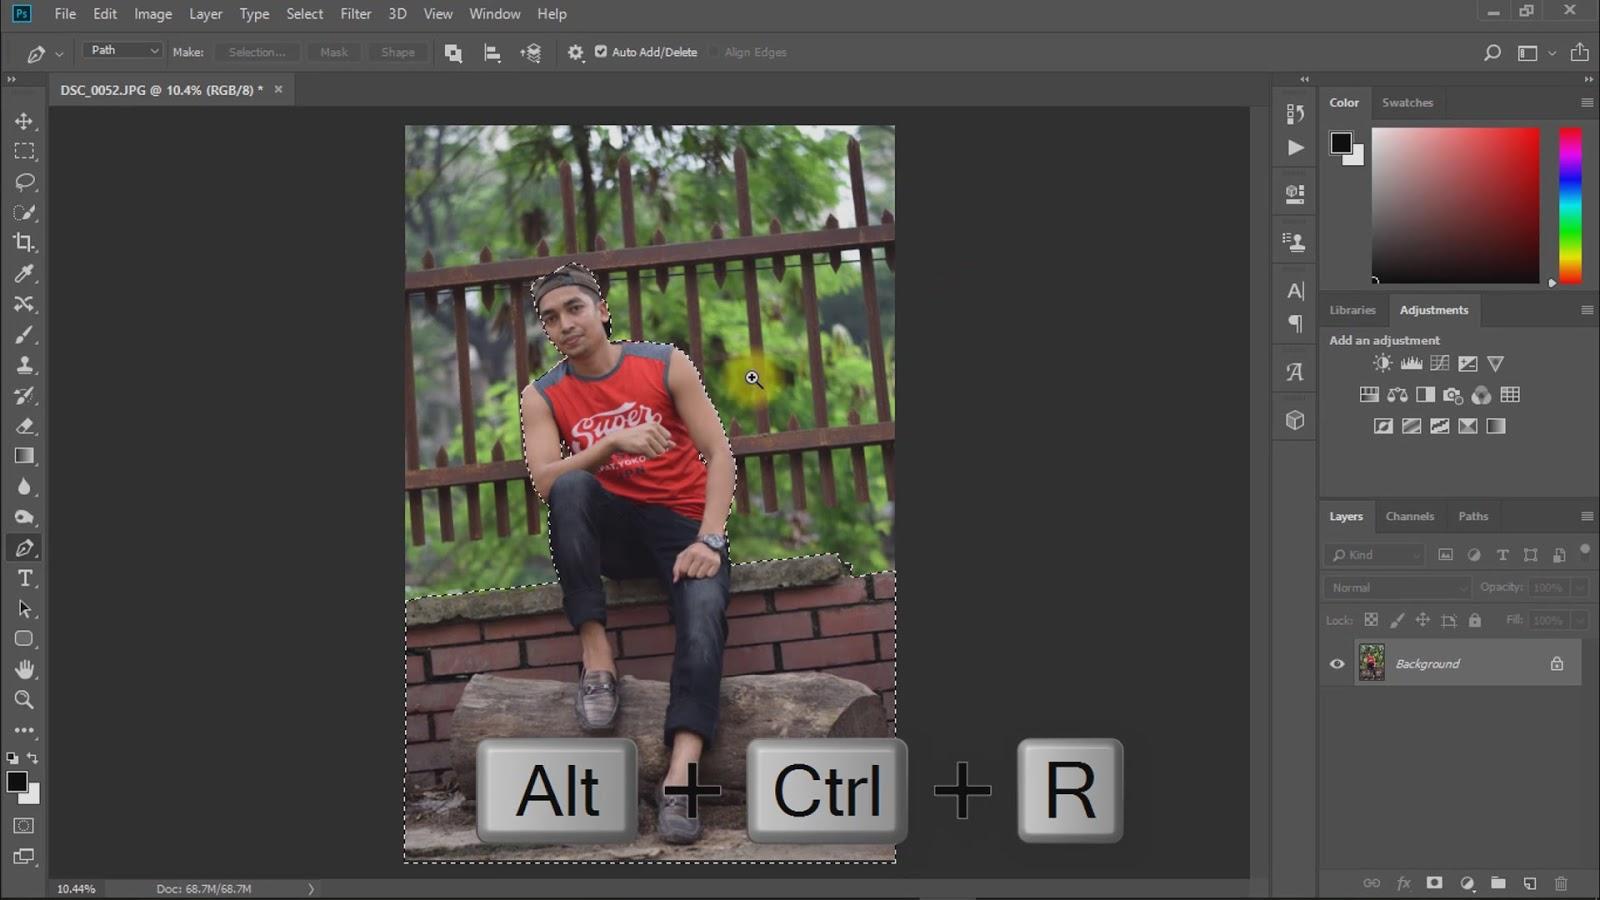 outdoor portrait photo manipulations working screenshot 1